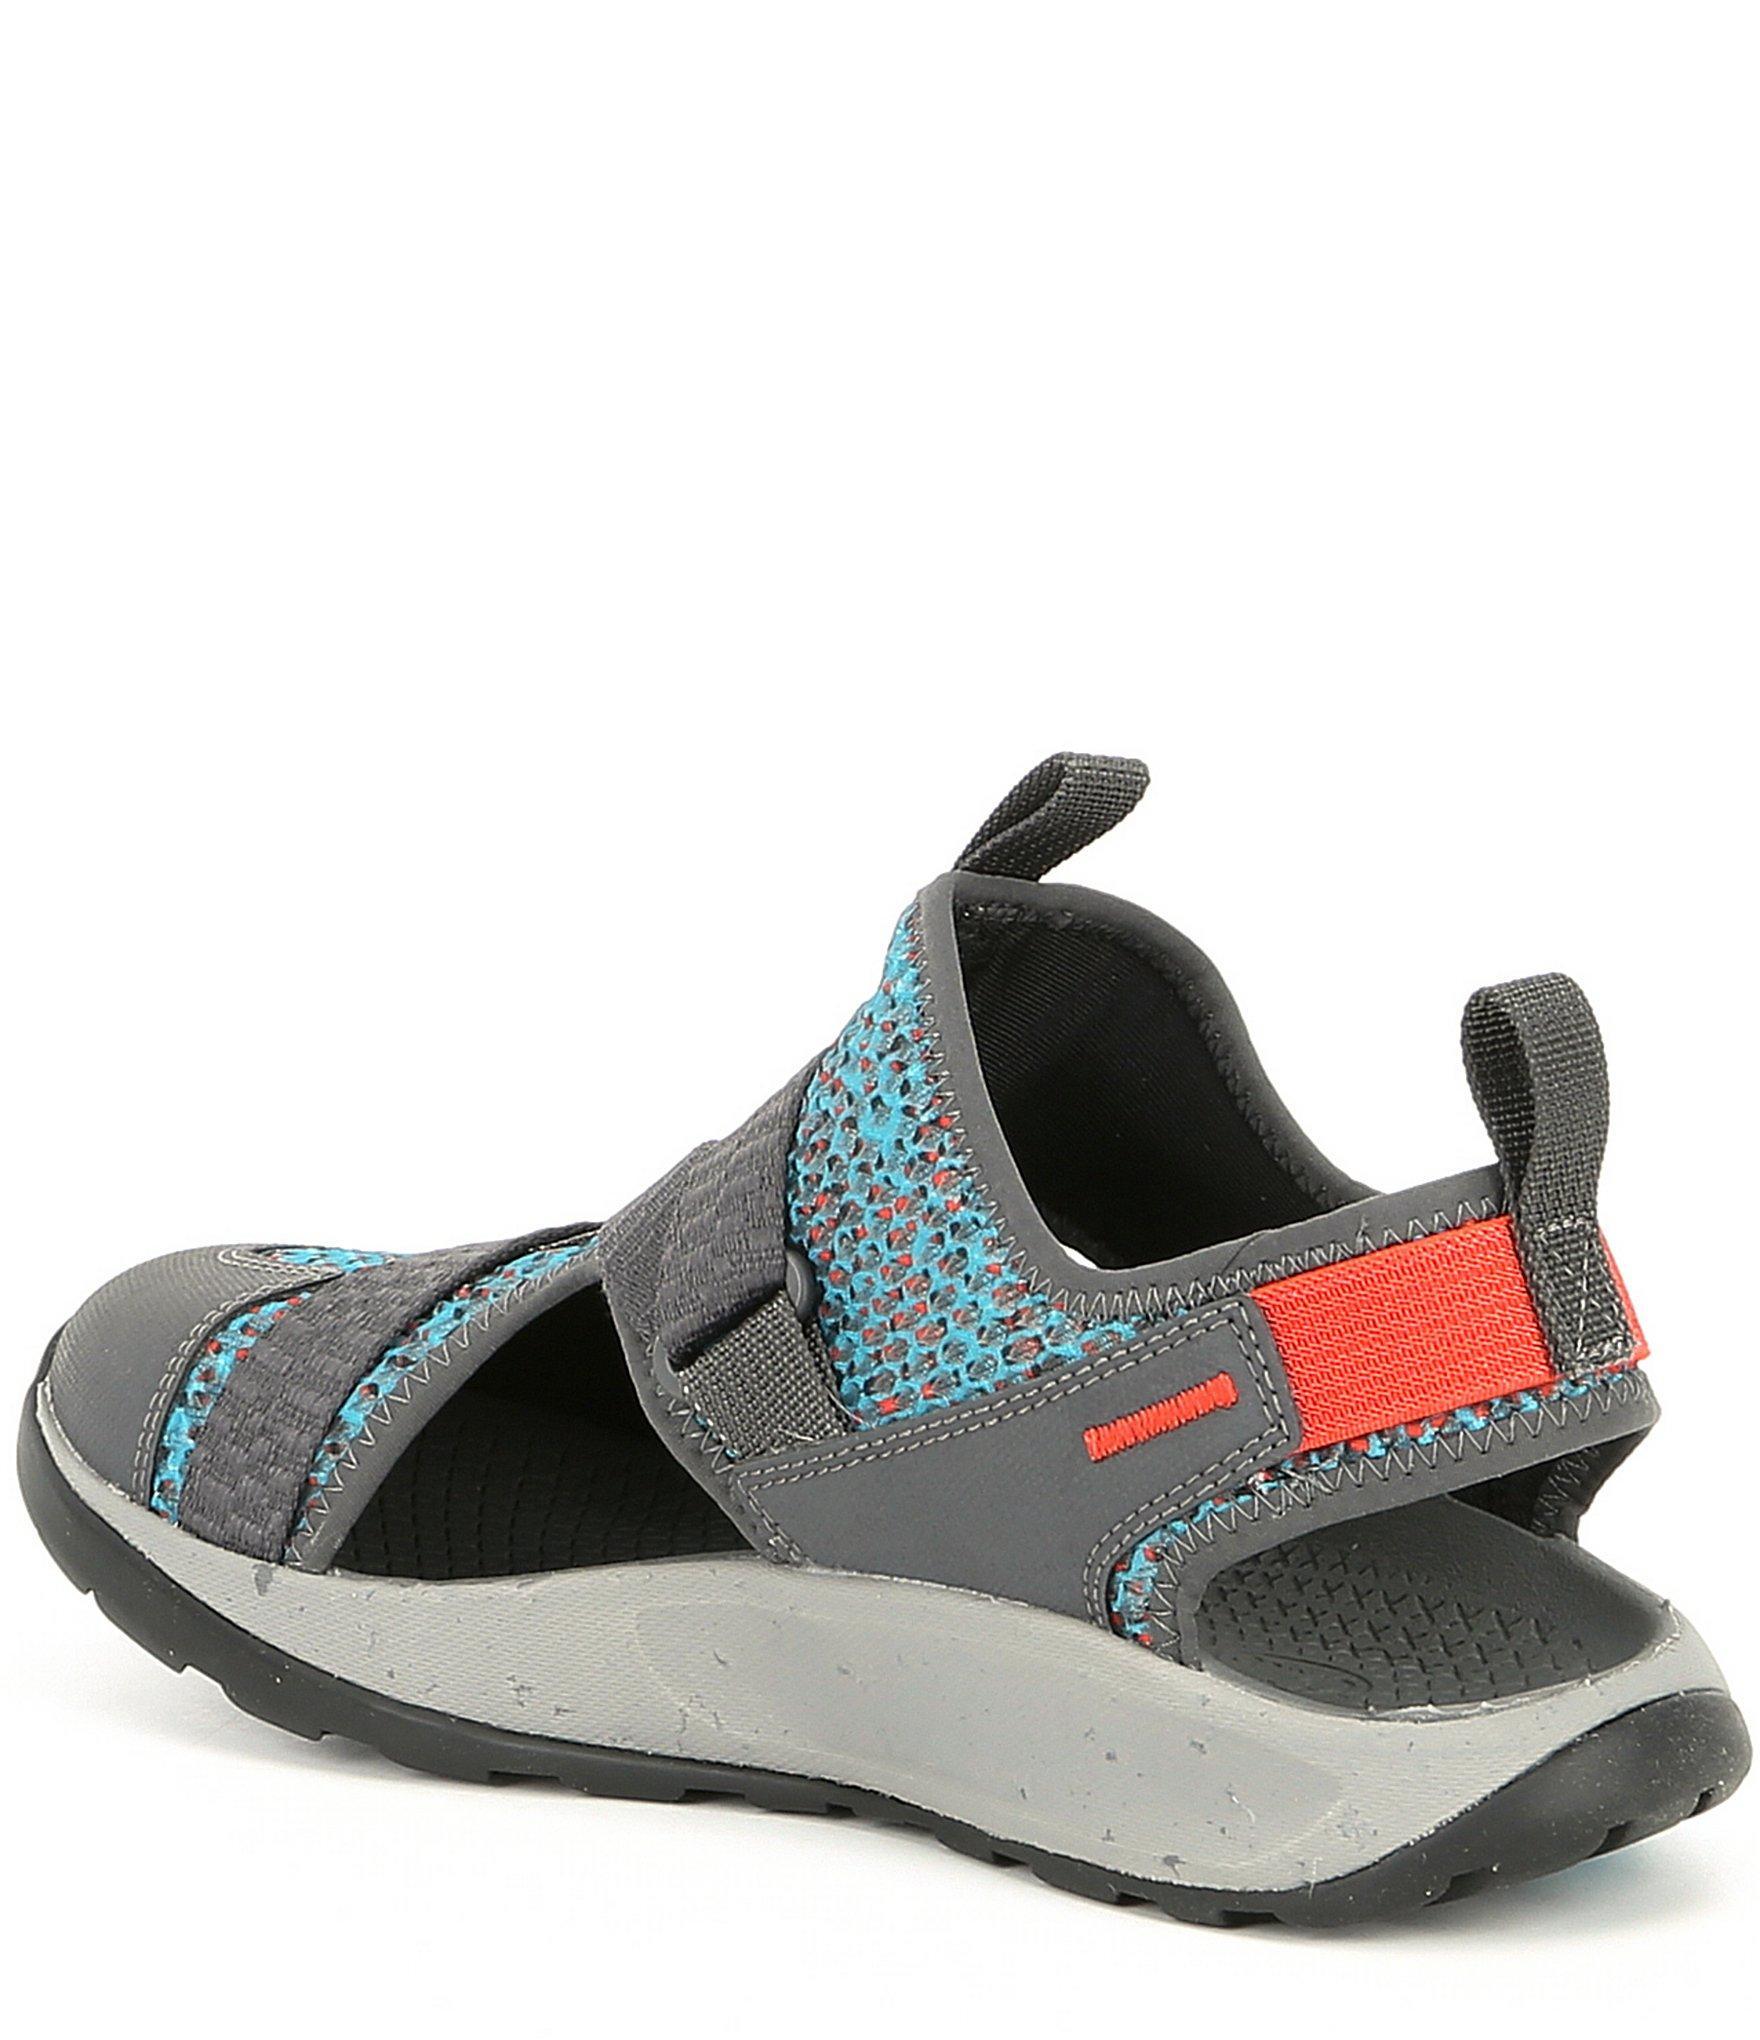 dfef85eb3bd1 Chaco - Blue Odyssey Closed Toe Sandals - Lyst. View fullscreen